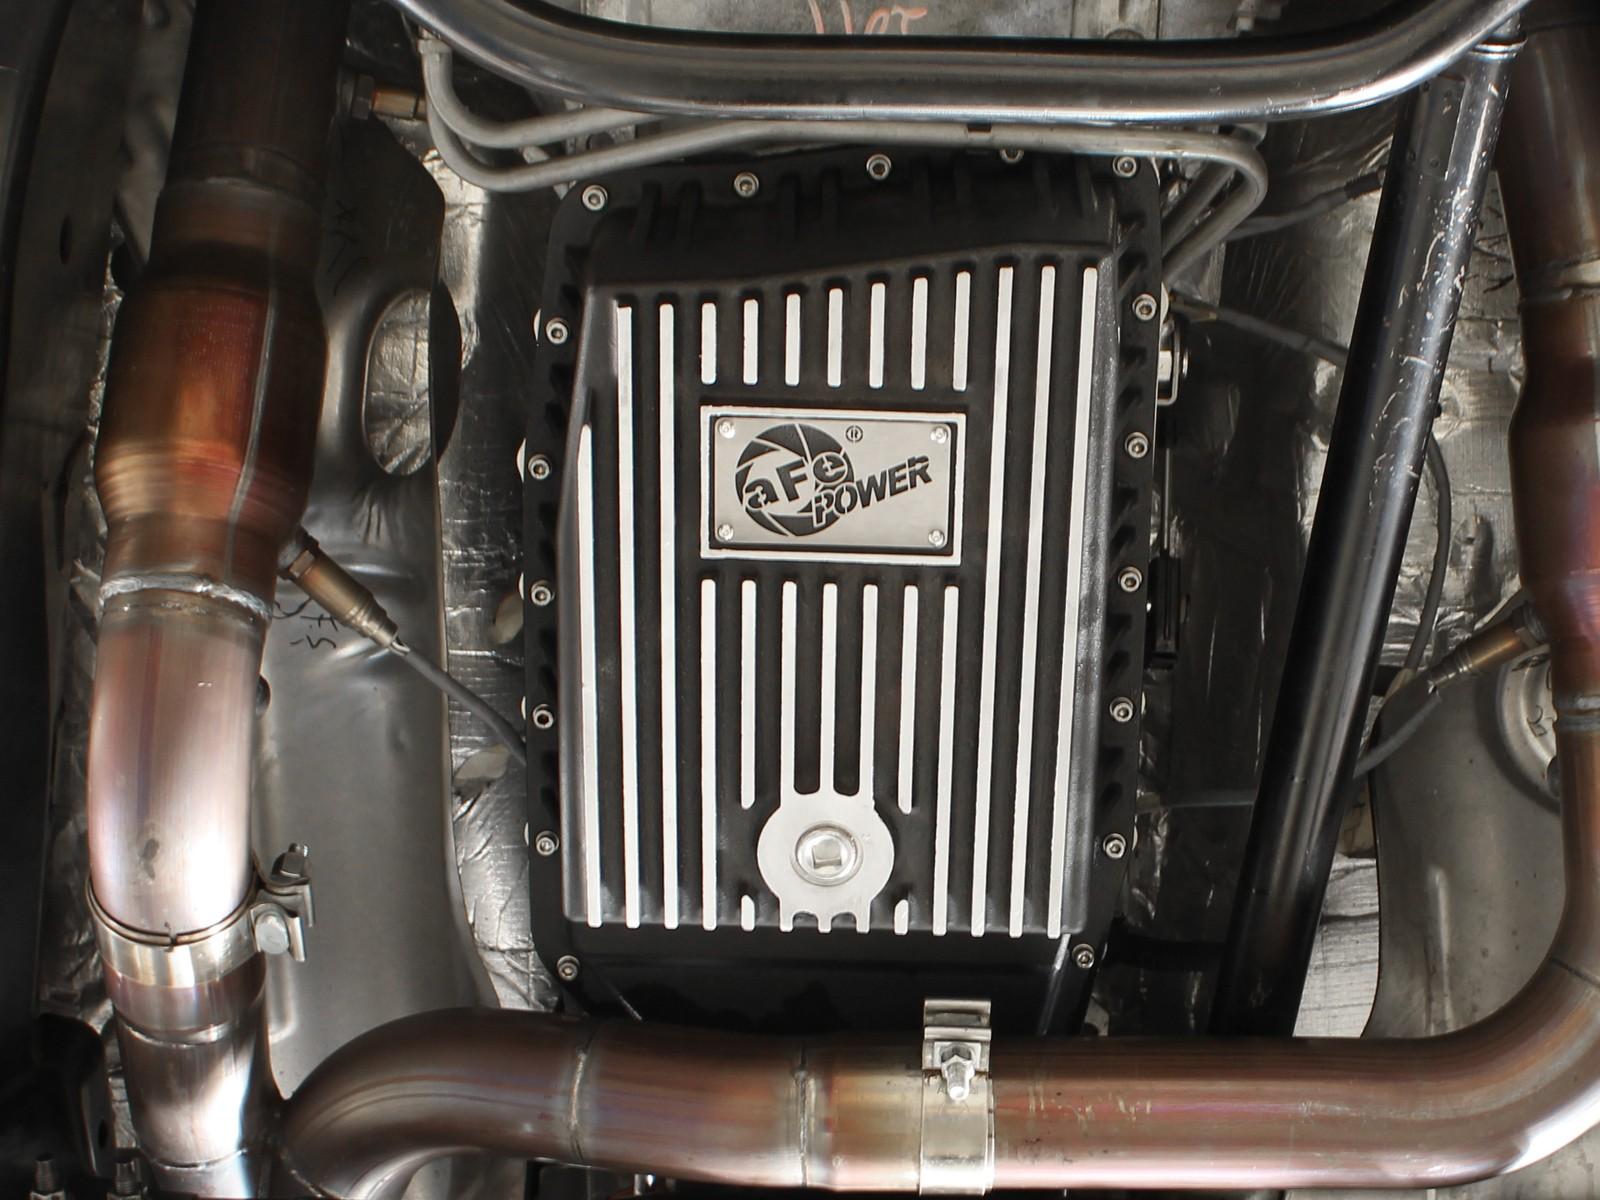 Afe power 46 70172 transmission pan machined fins